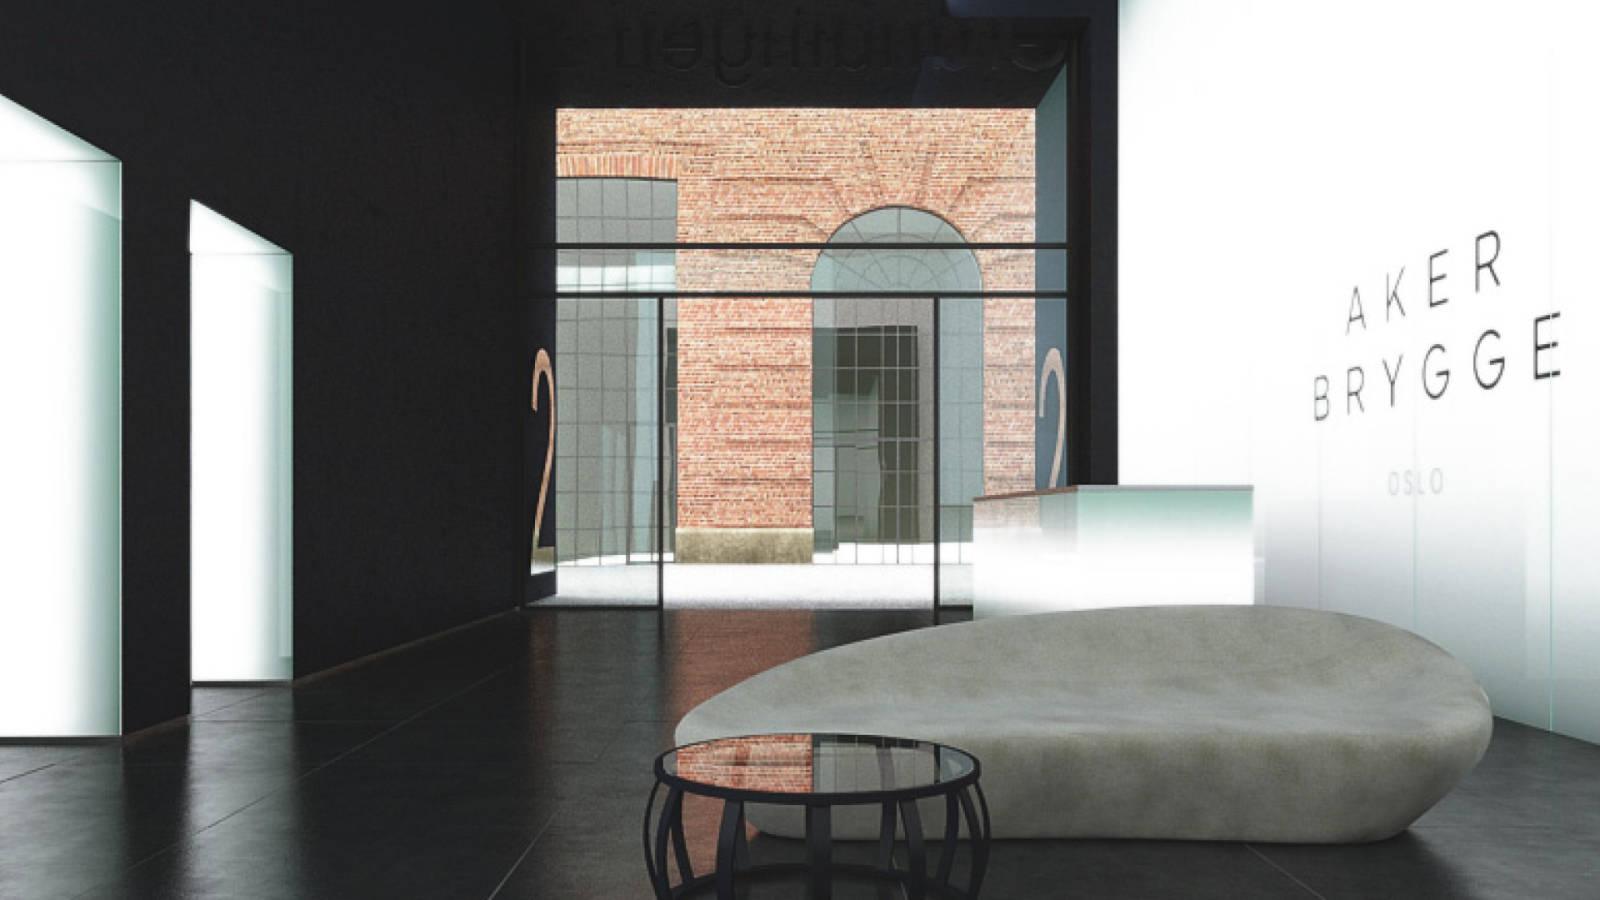 OFFICE LOBBIES - Aker Brygge Masterplan - SPOL Architects